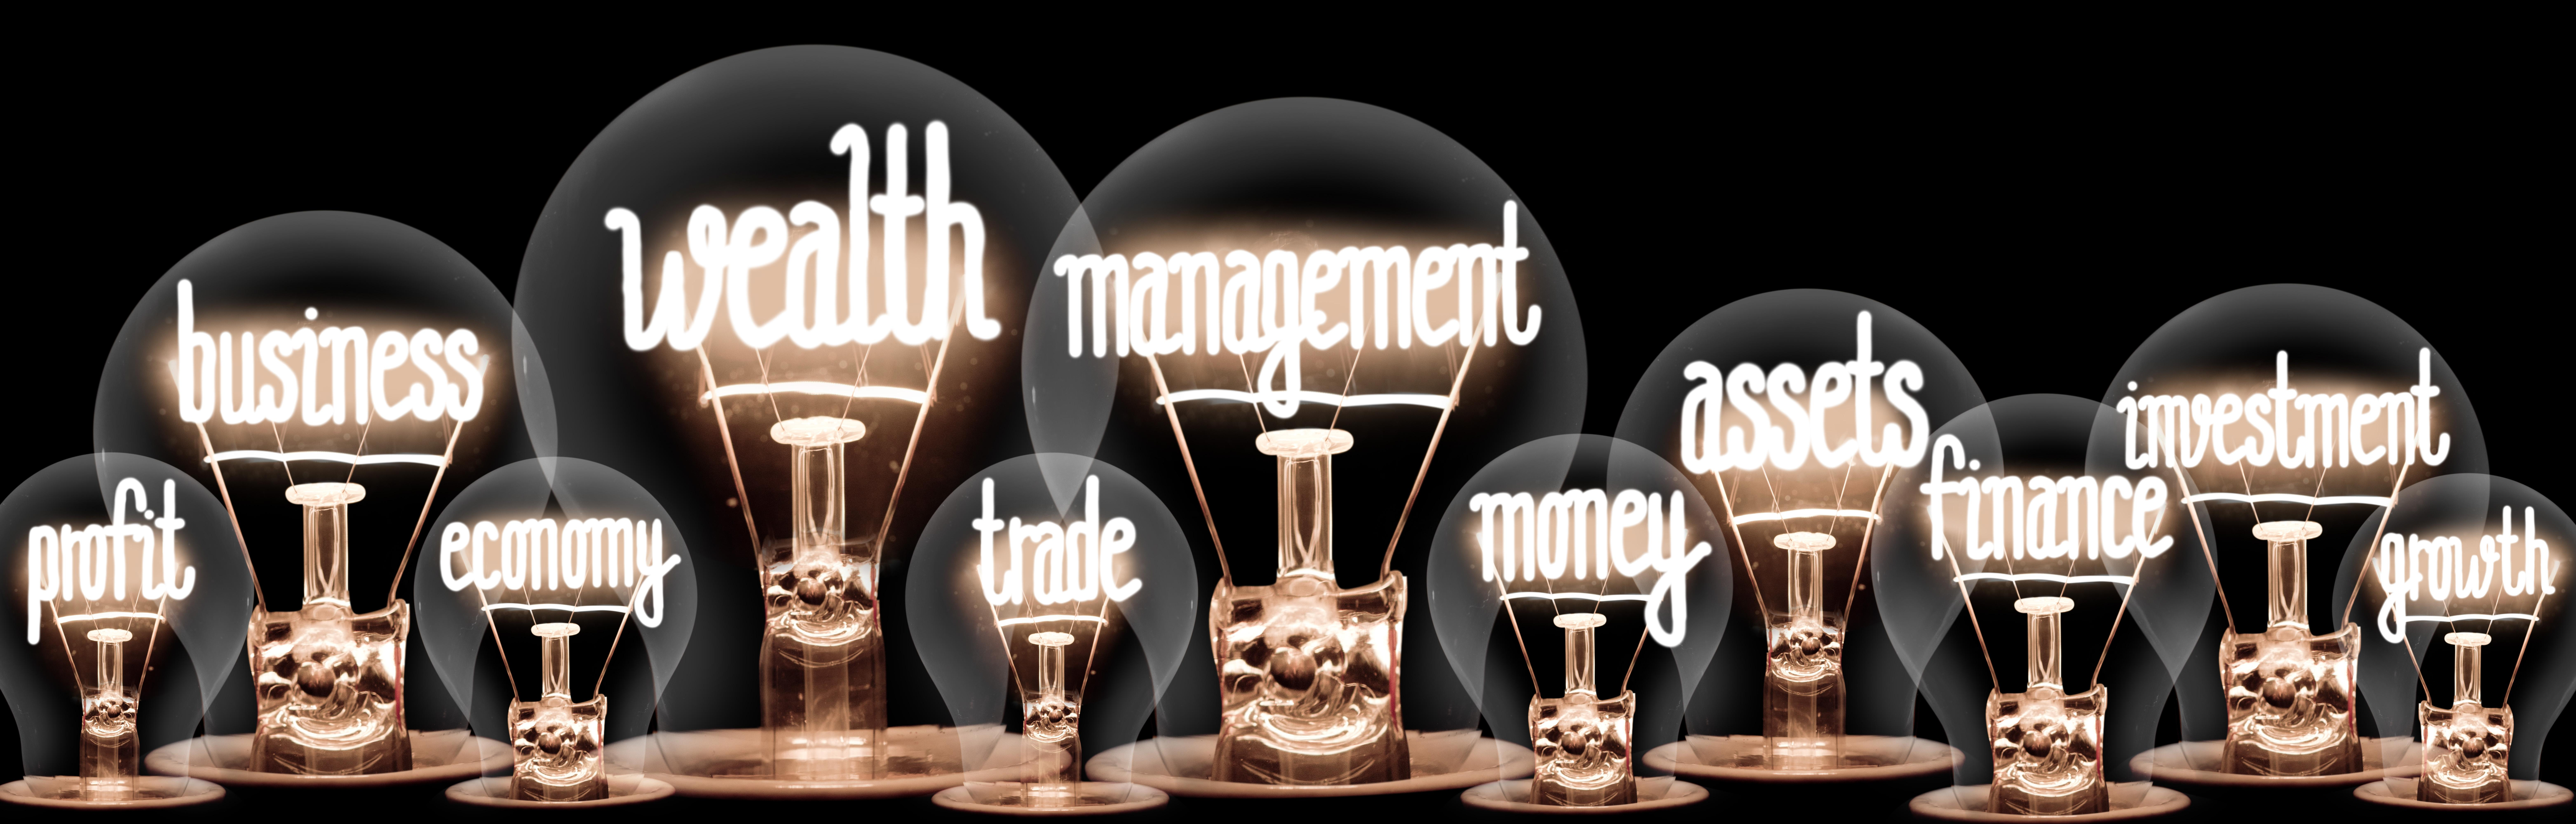 benefits of wealth management